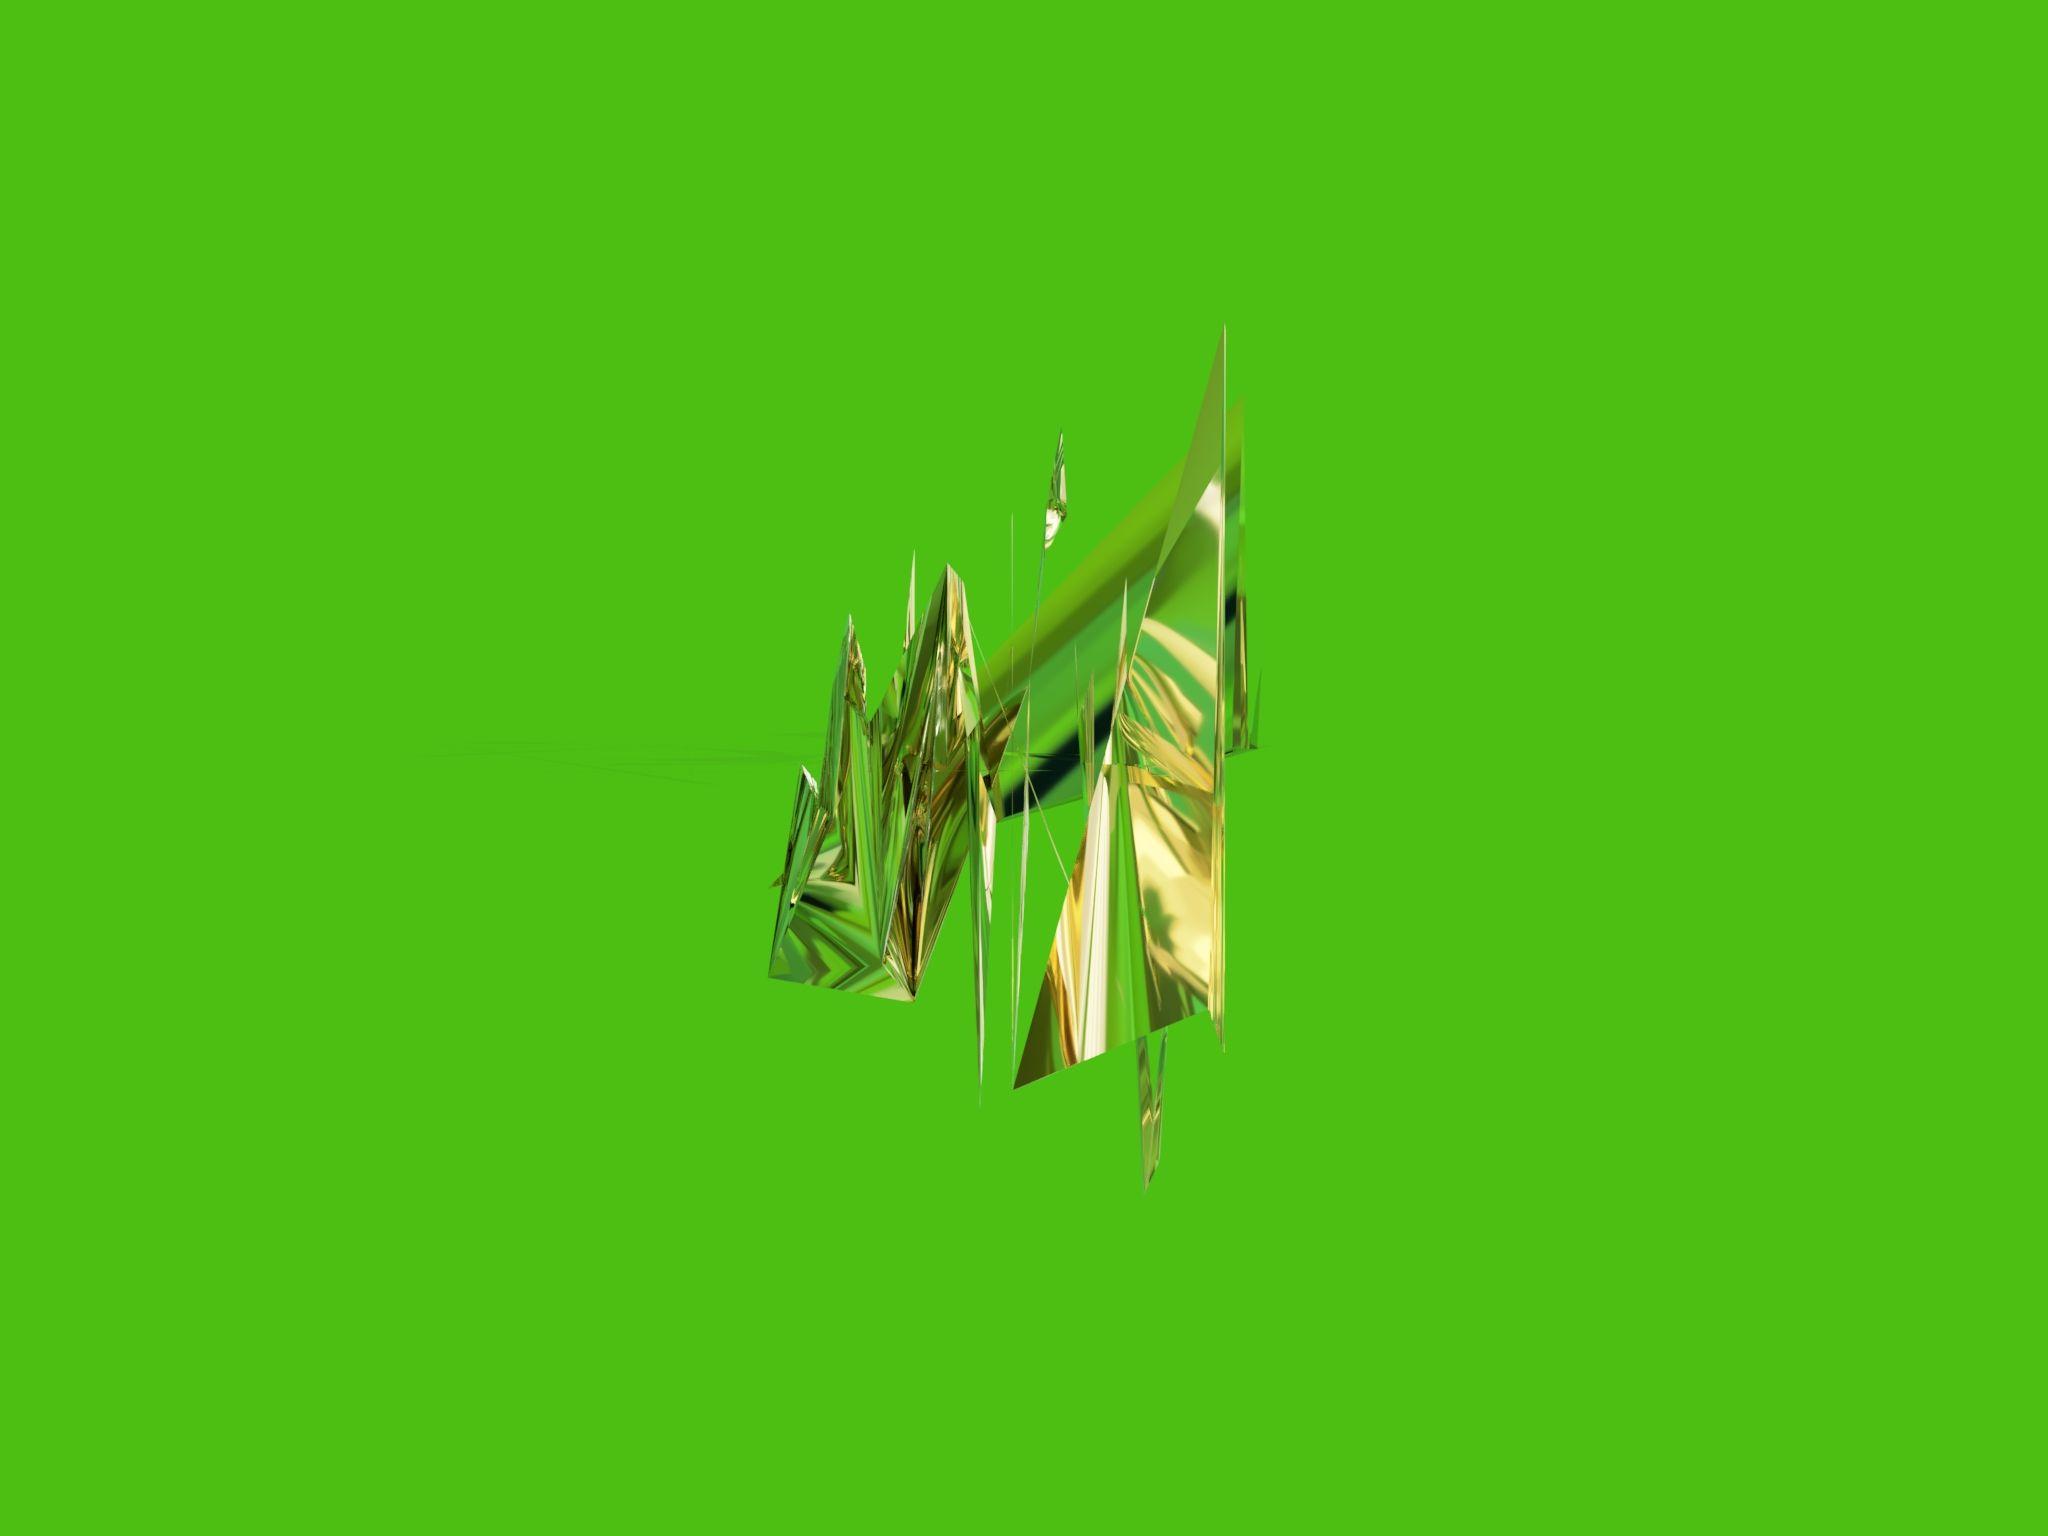 Raasrendering-bf5c36ac-1e72-43ef-9037-1268d1f6ca2d-3500-3500